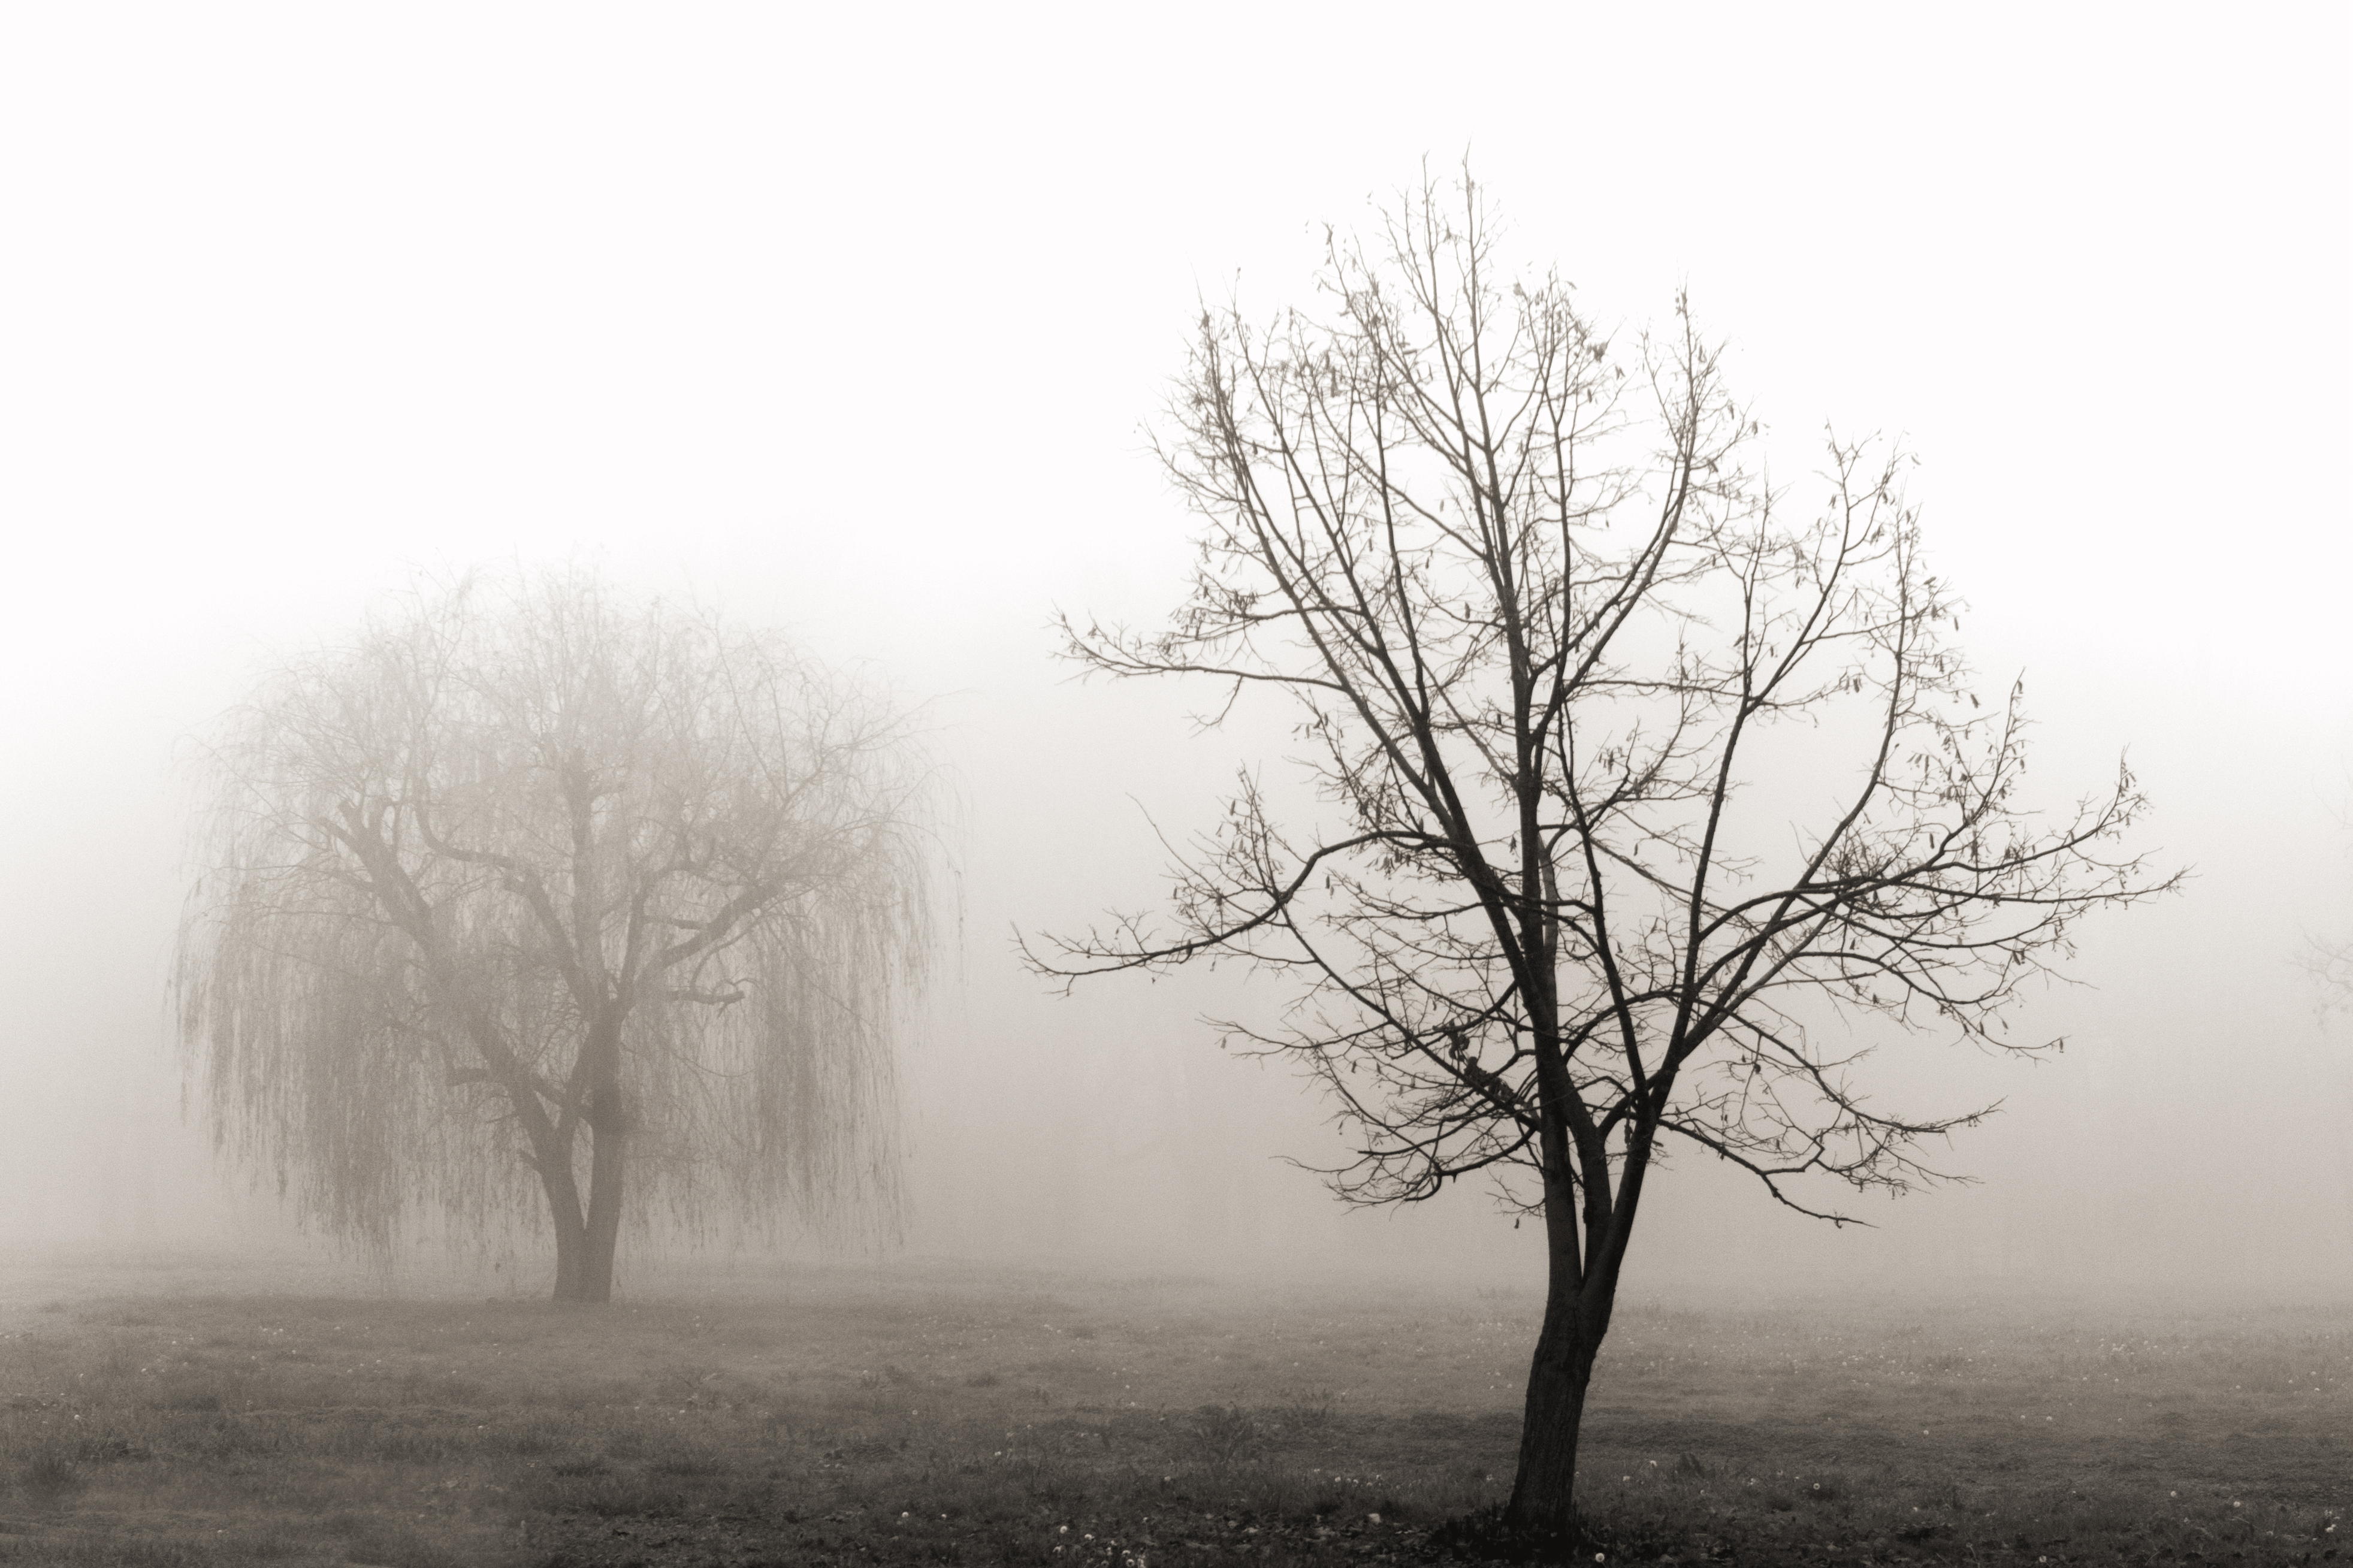 mist by housel1984